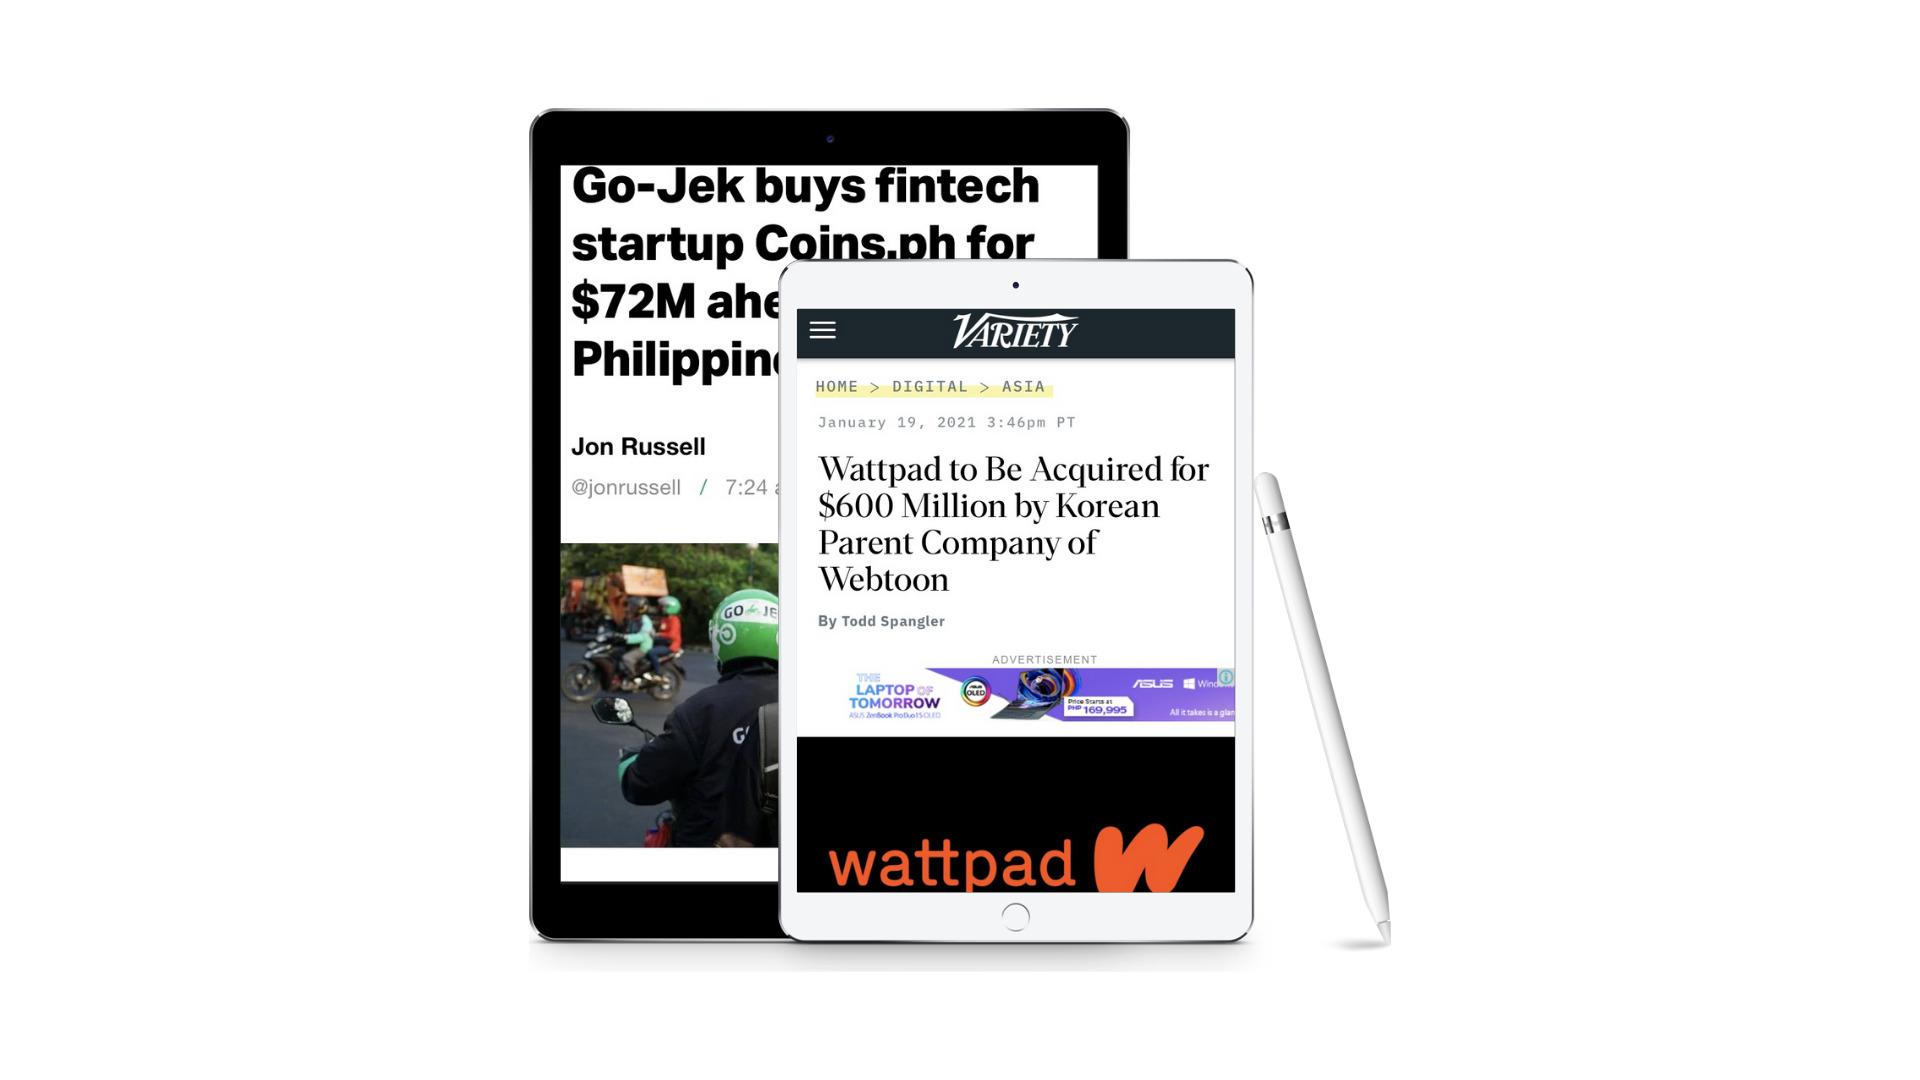 Philippines Kickstart invests data